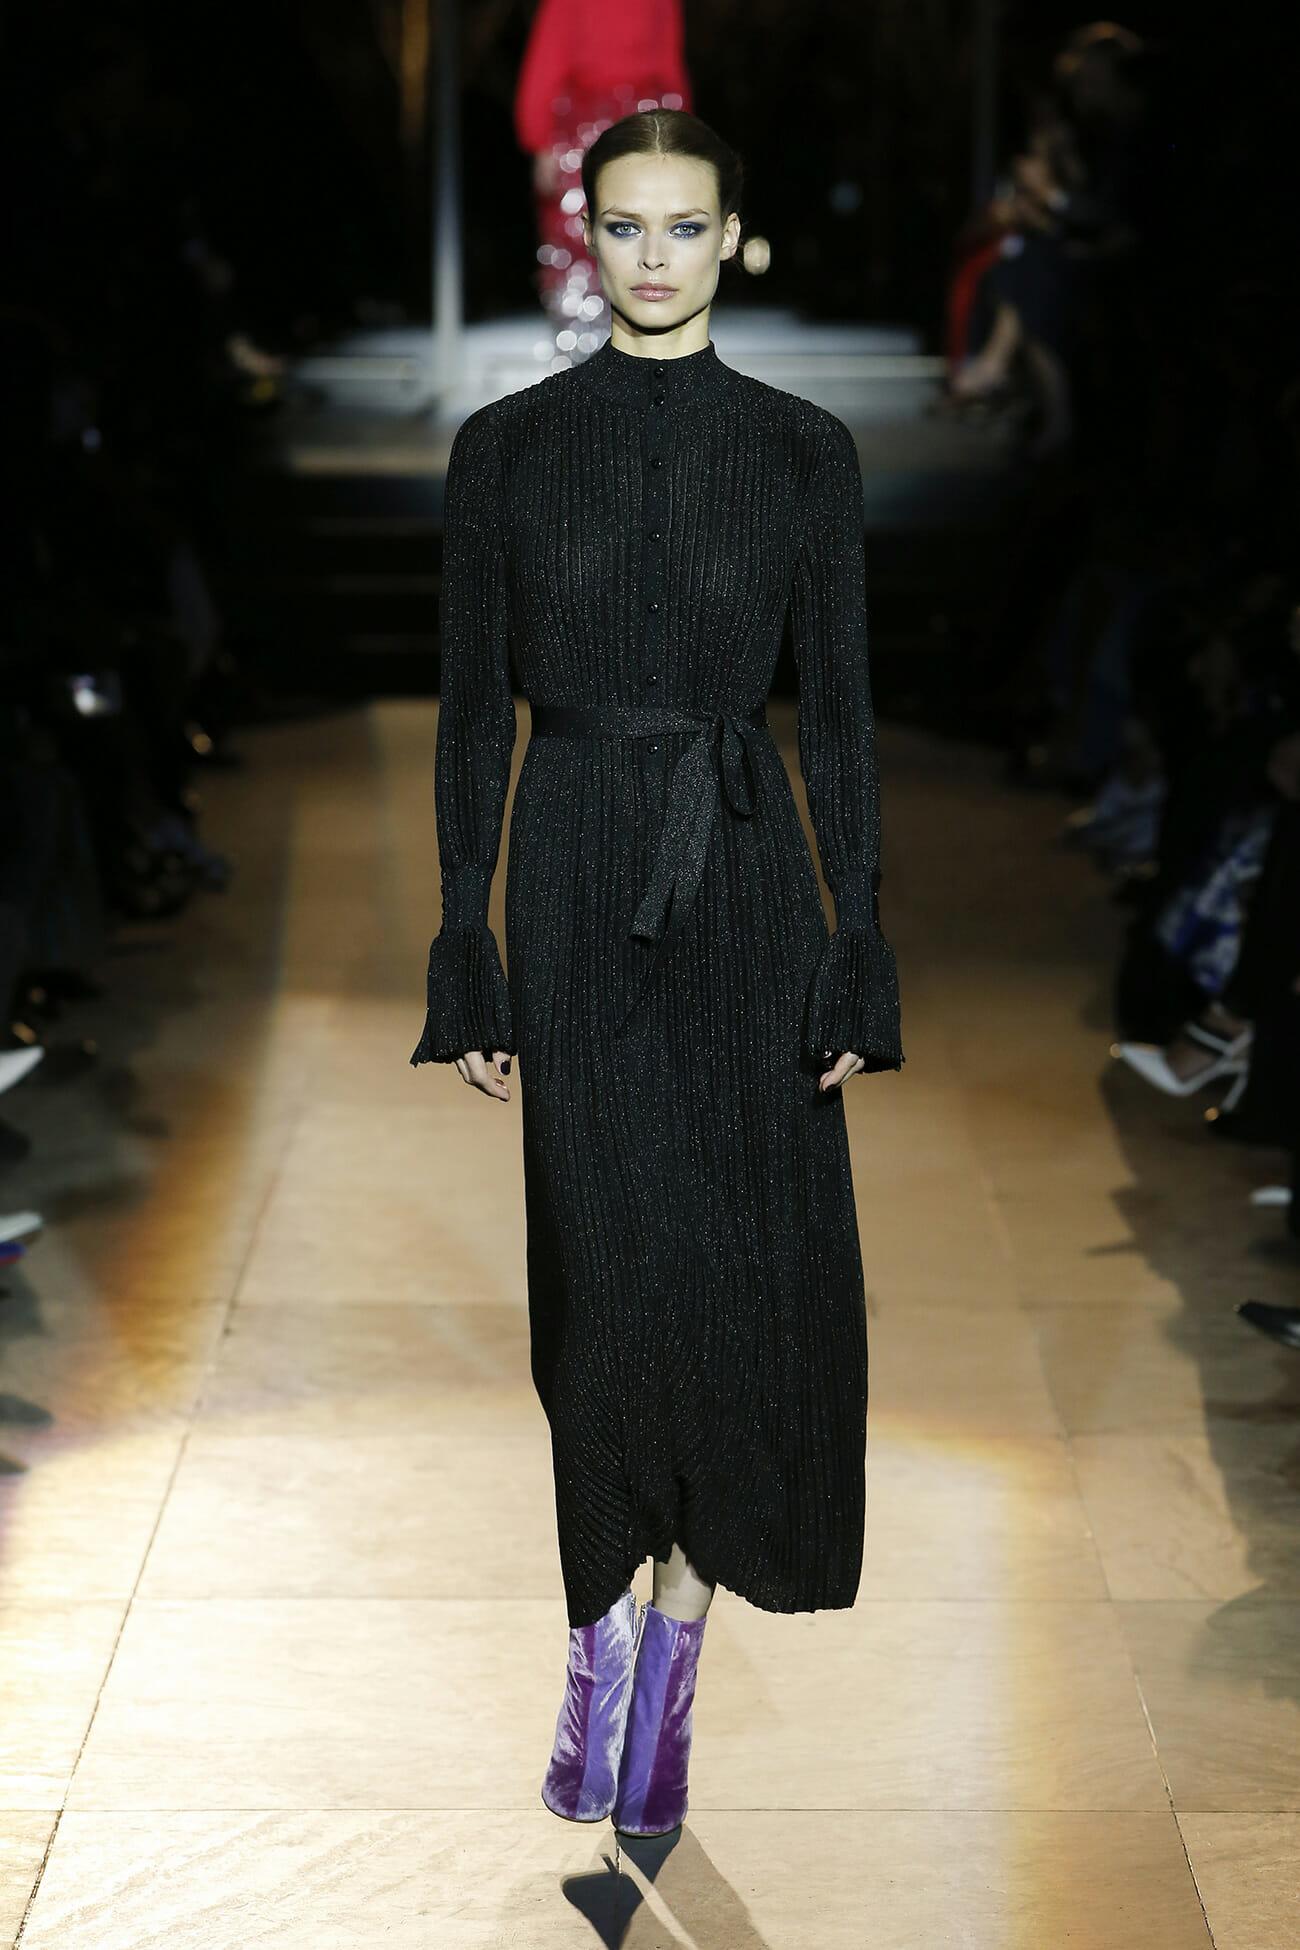 Carolina Herrera News, Collections, Fashion Shows, Fashion Week Carolina herrera international fashion designer